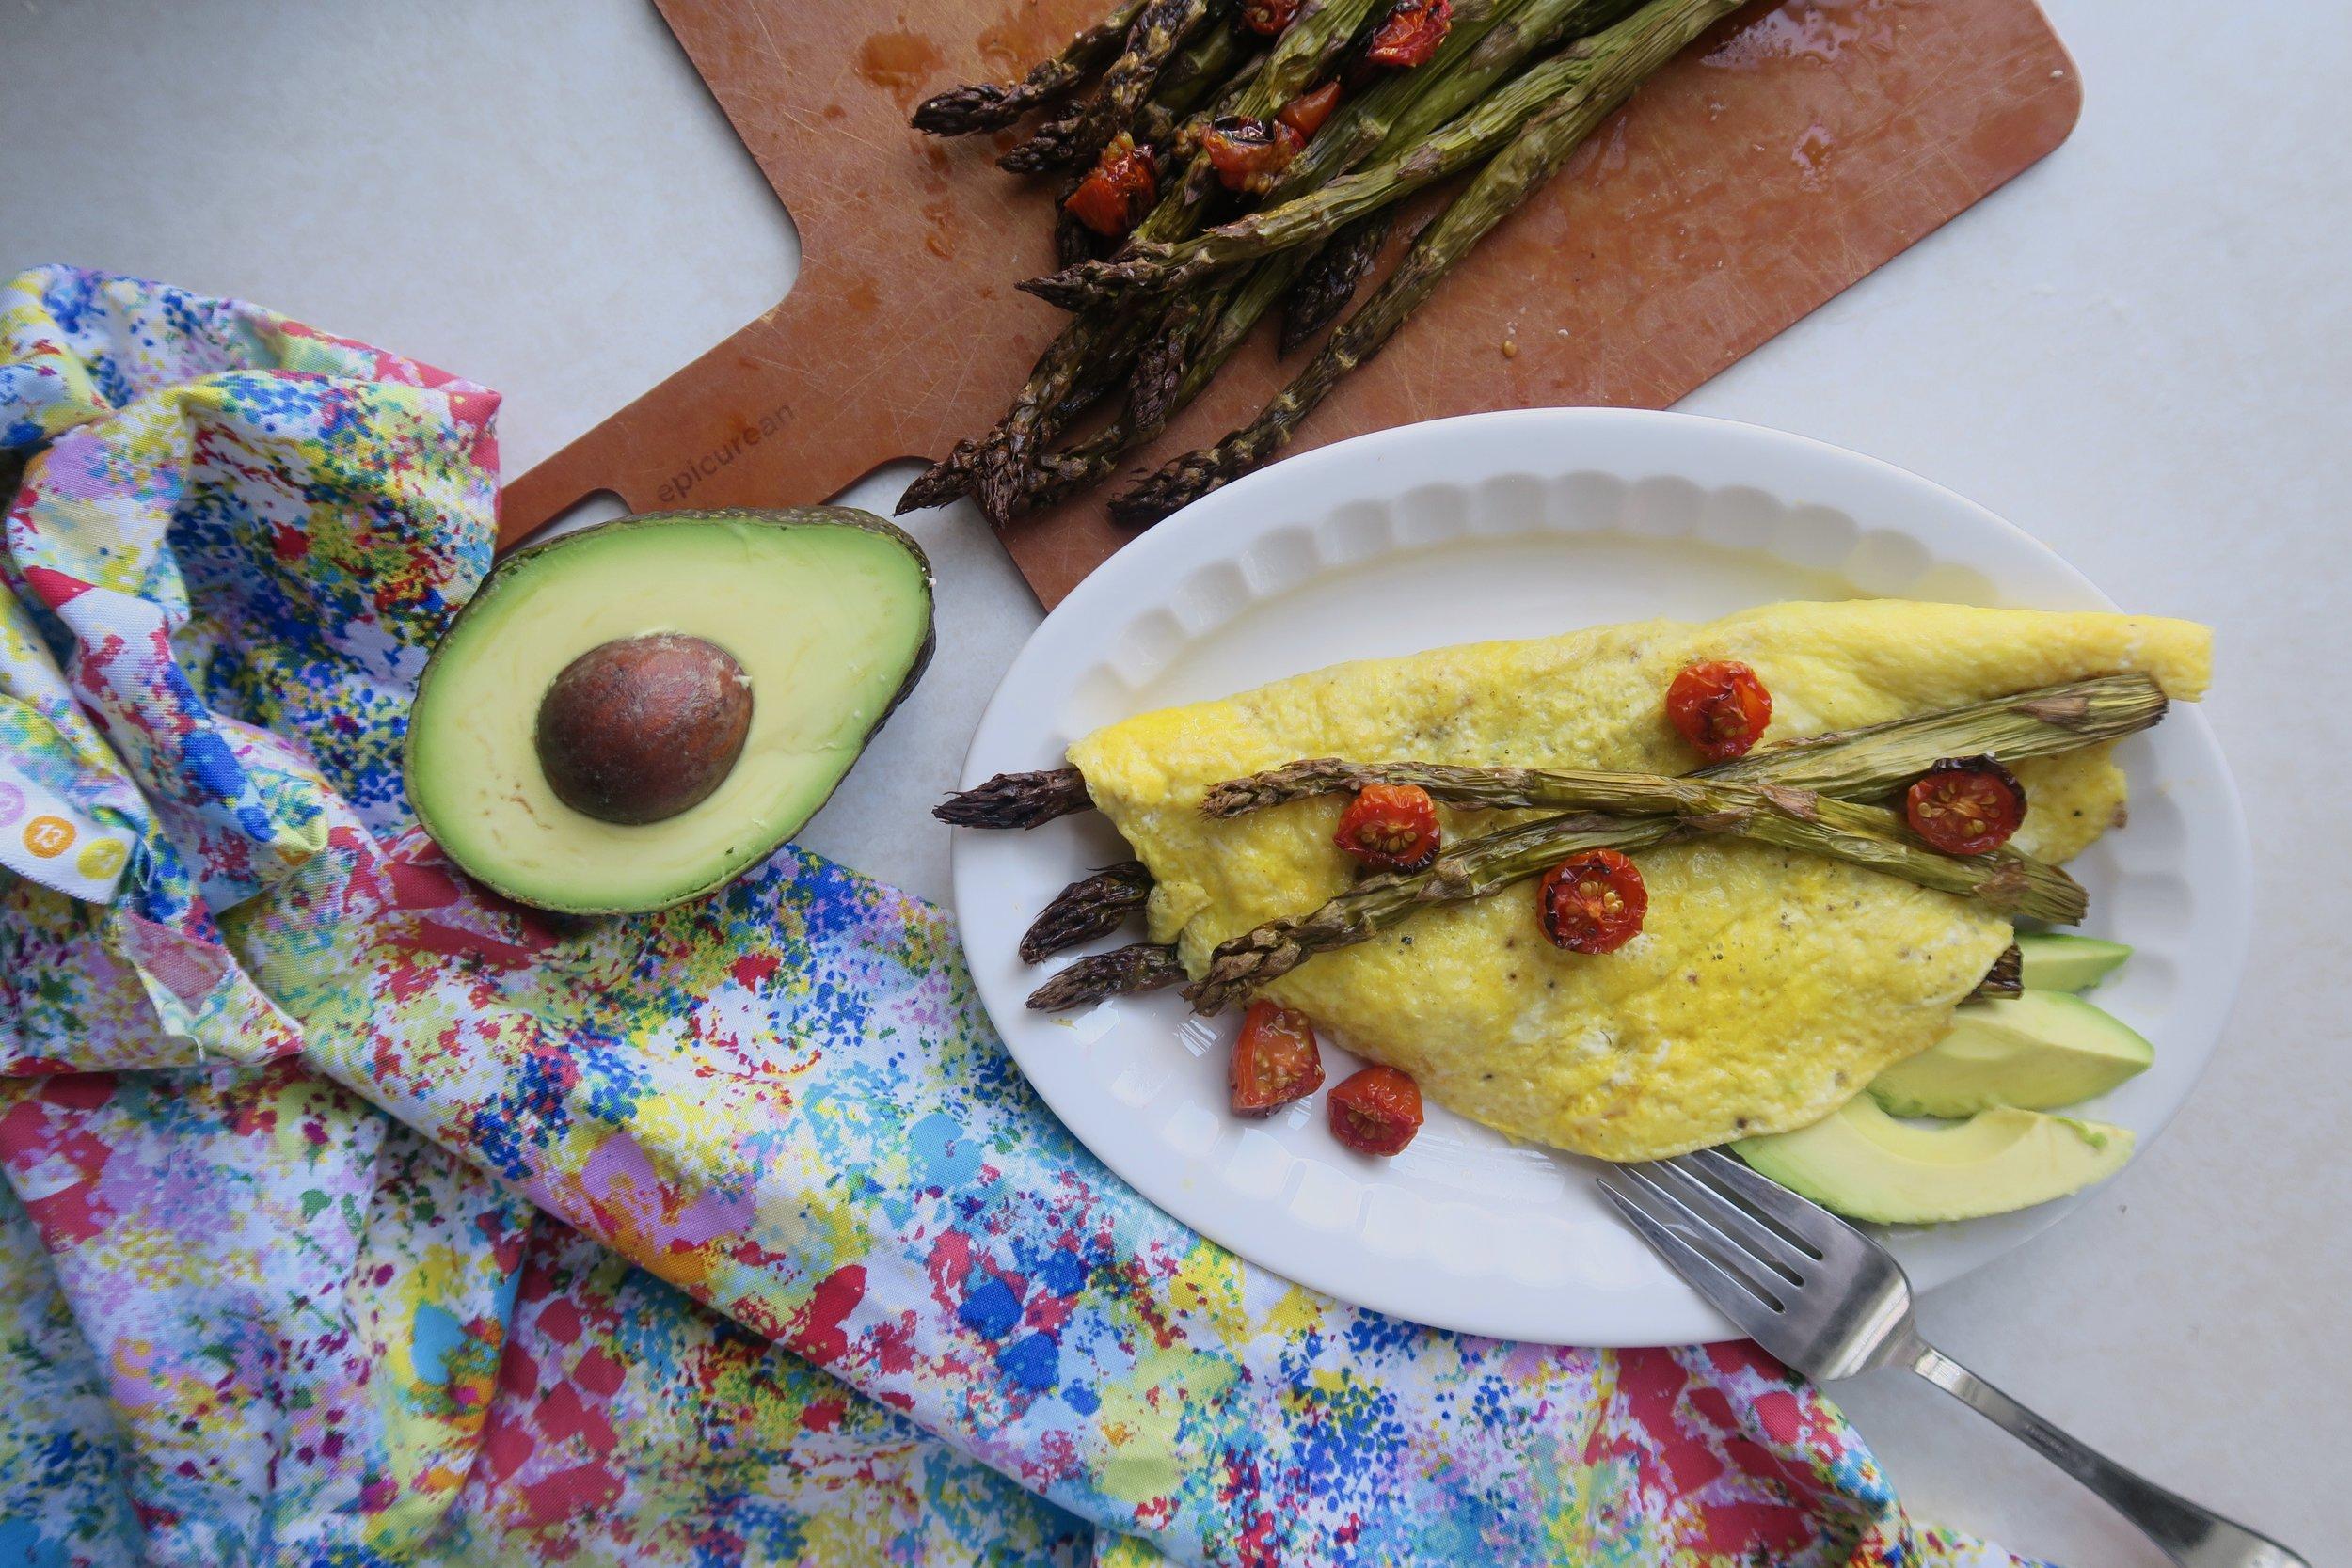 Lake Superior kitchen, duluth food, detox, asparagus, omelette, healthy breakfast